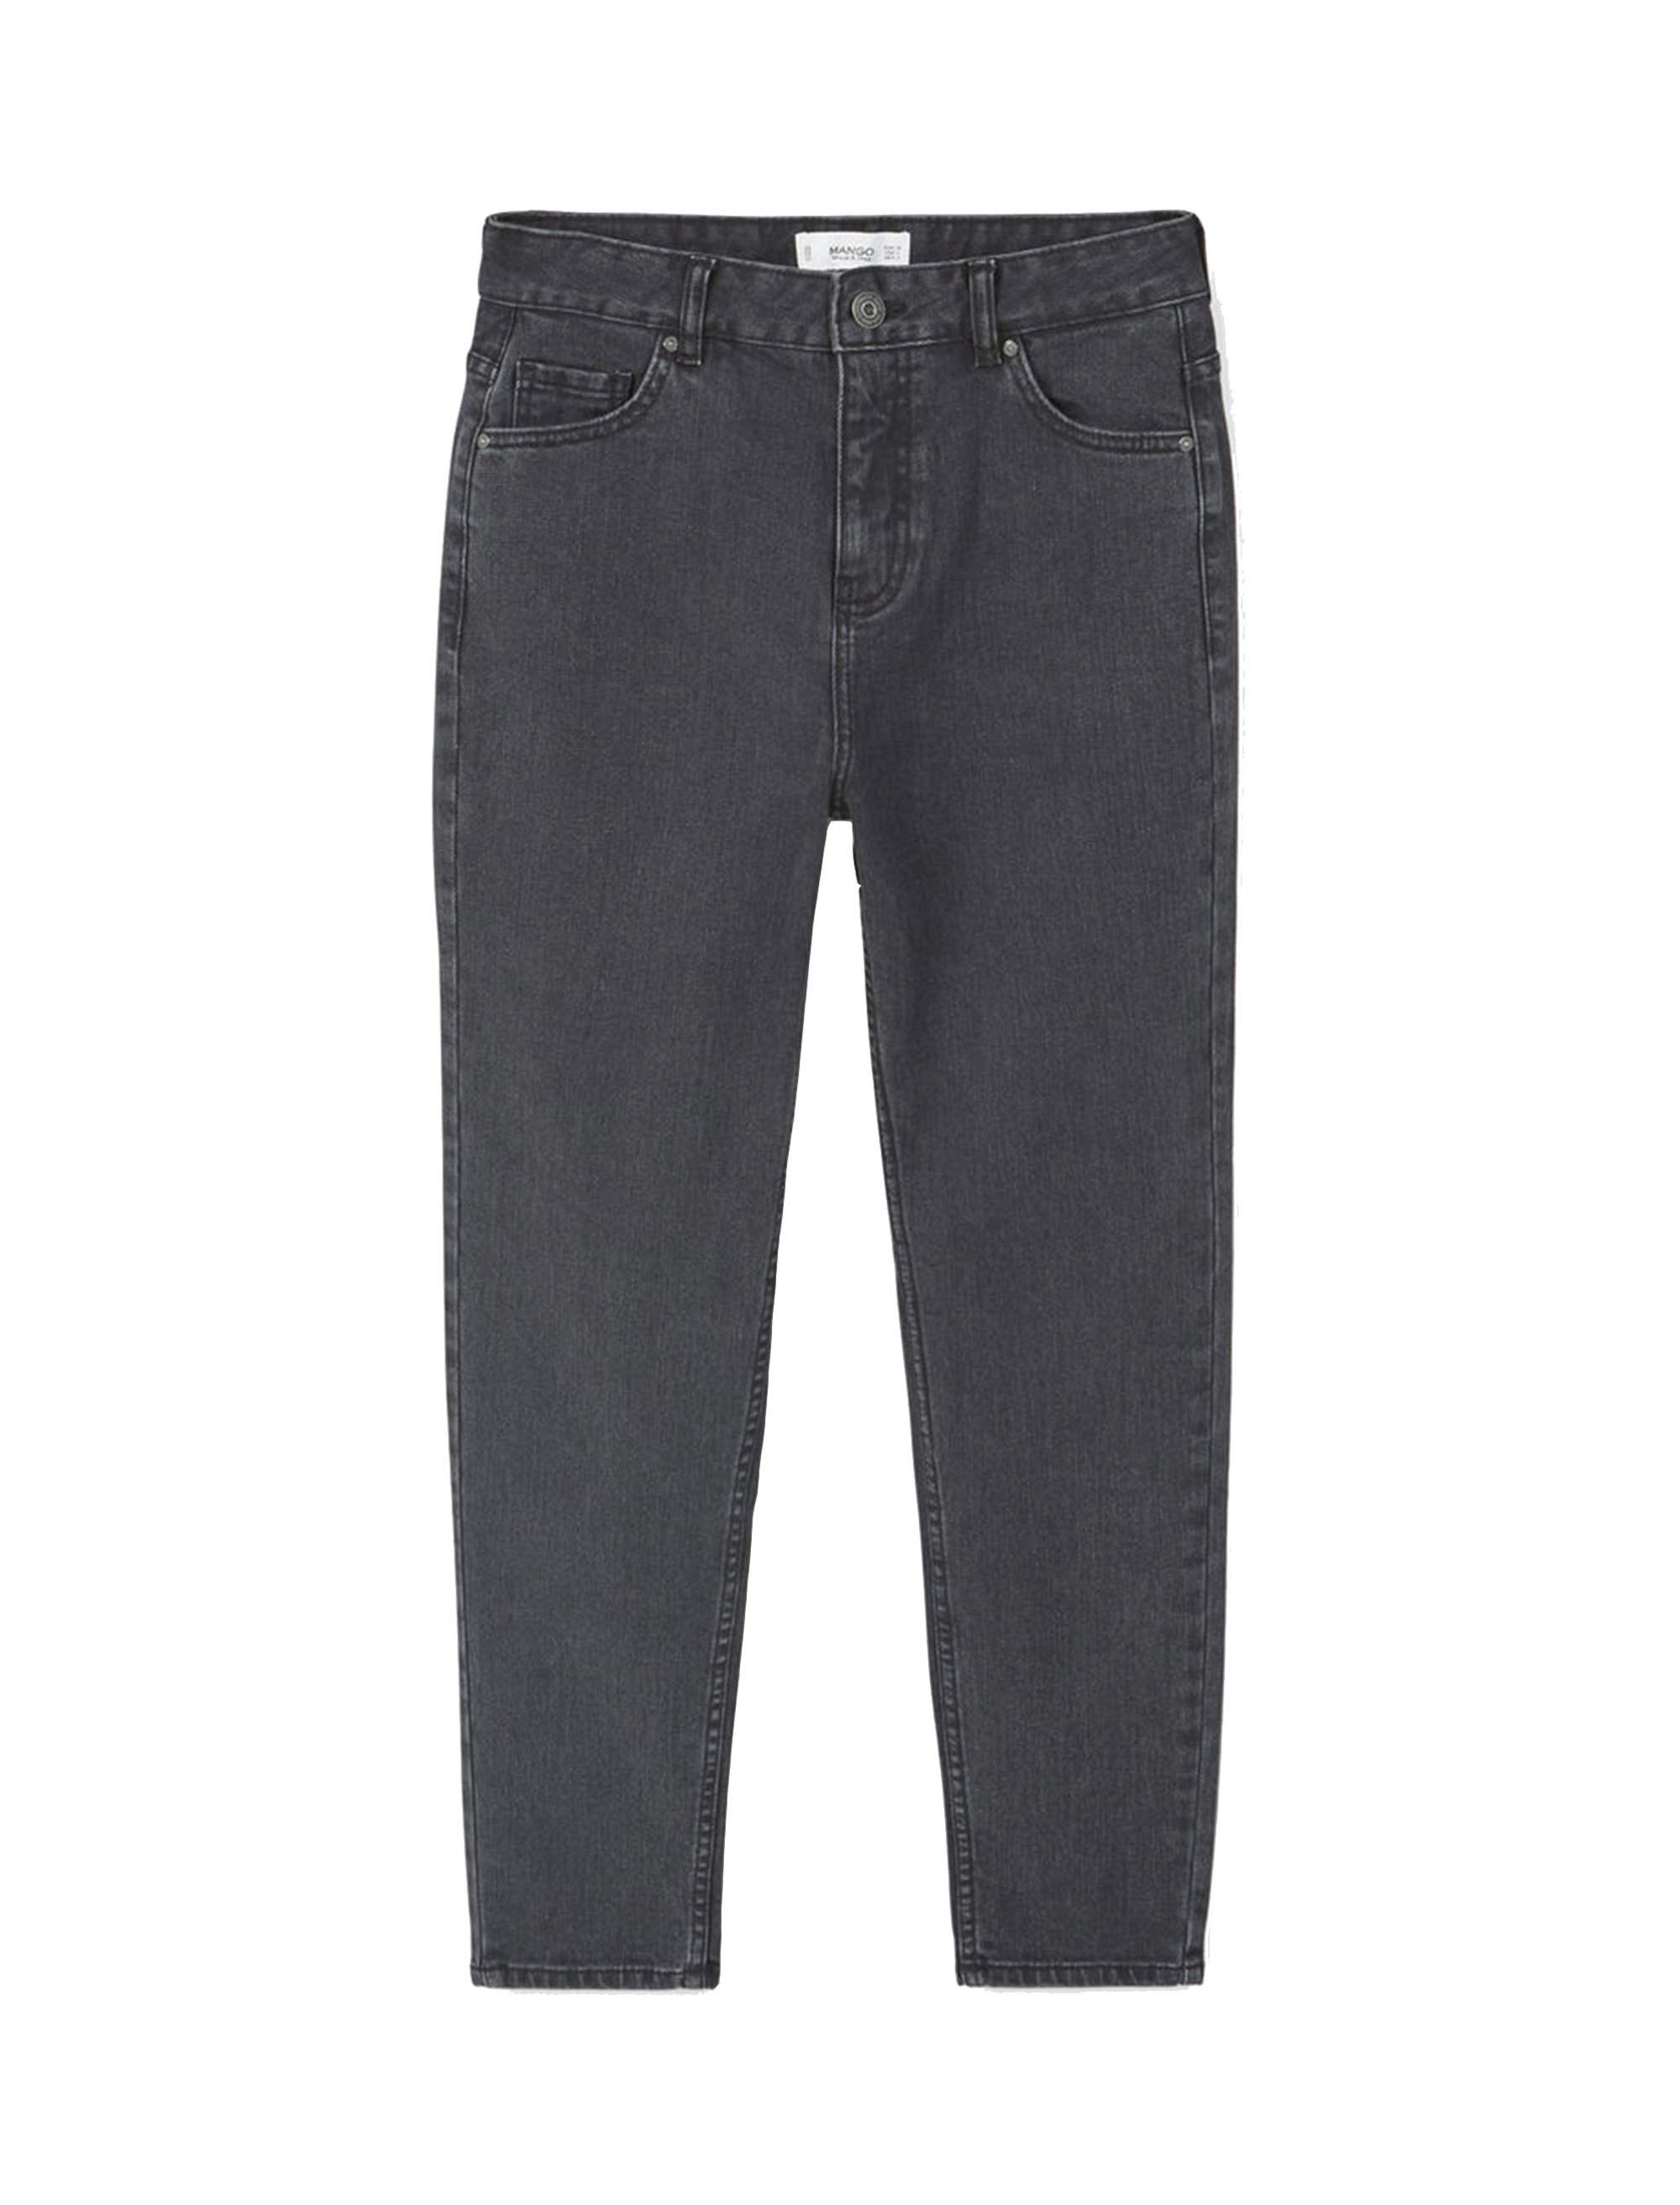 شلوار جین راسته زنانه - مانگو - زغالي - 1